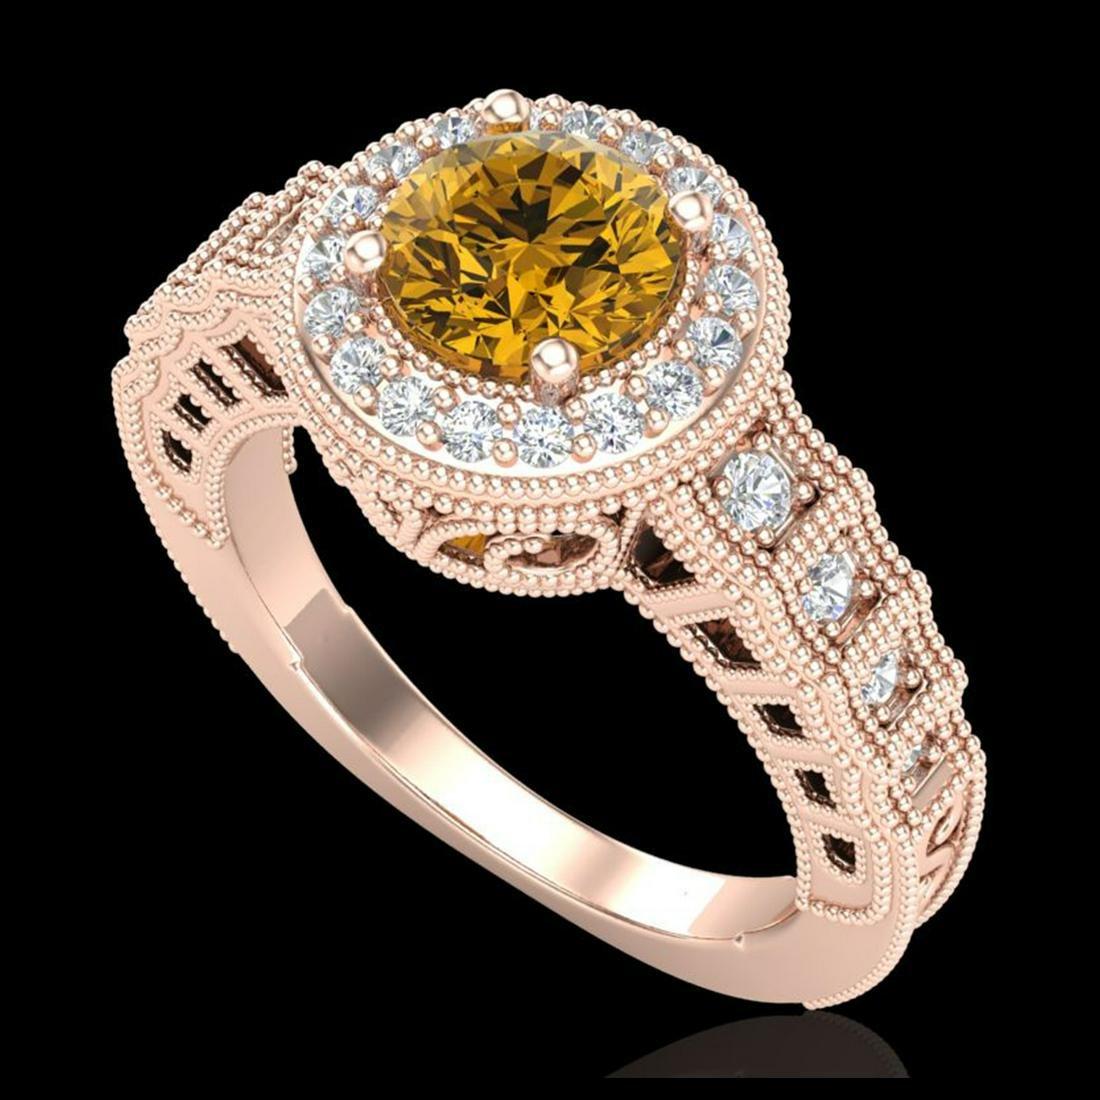 1.53 ctw Intense Fancy Yellow Diamond Art Deco Ring 18K